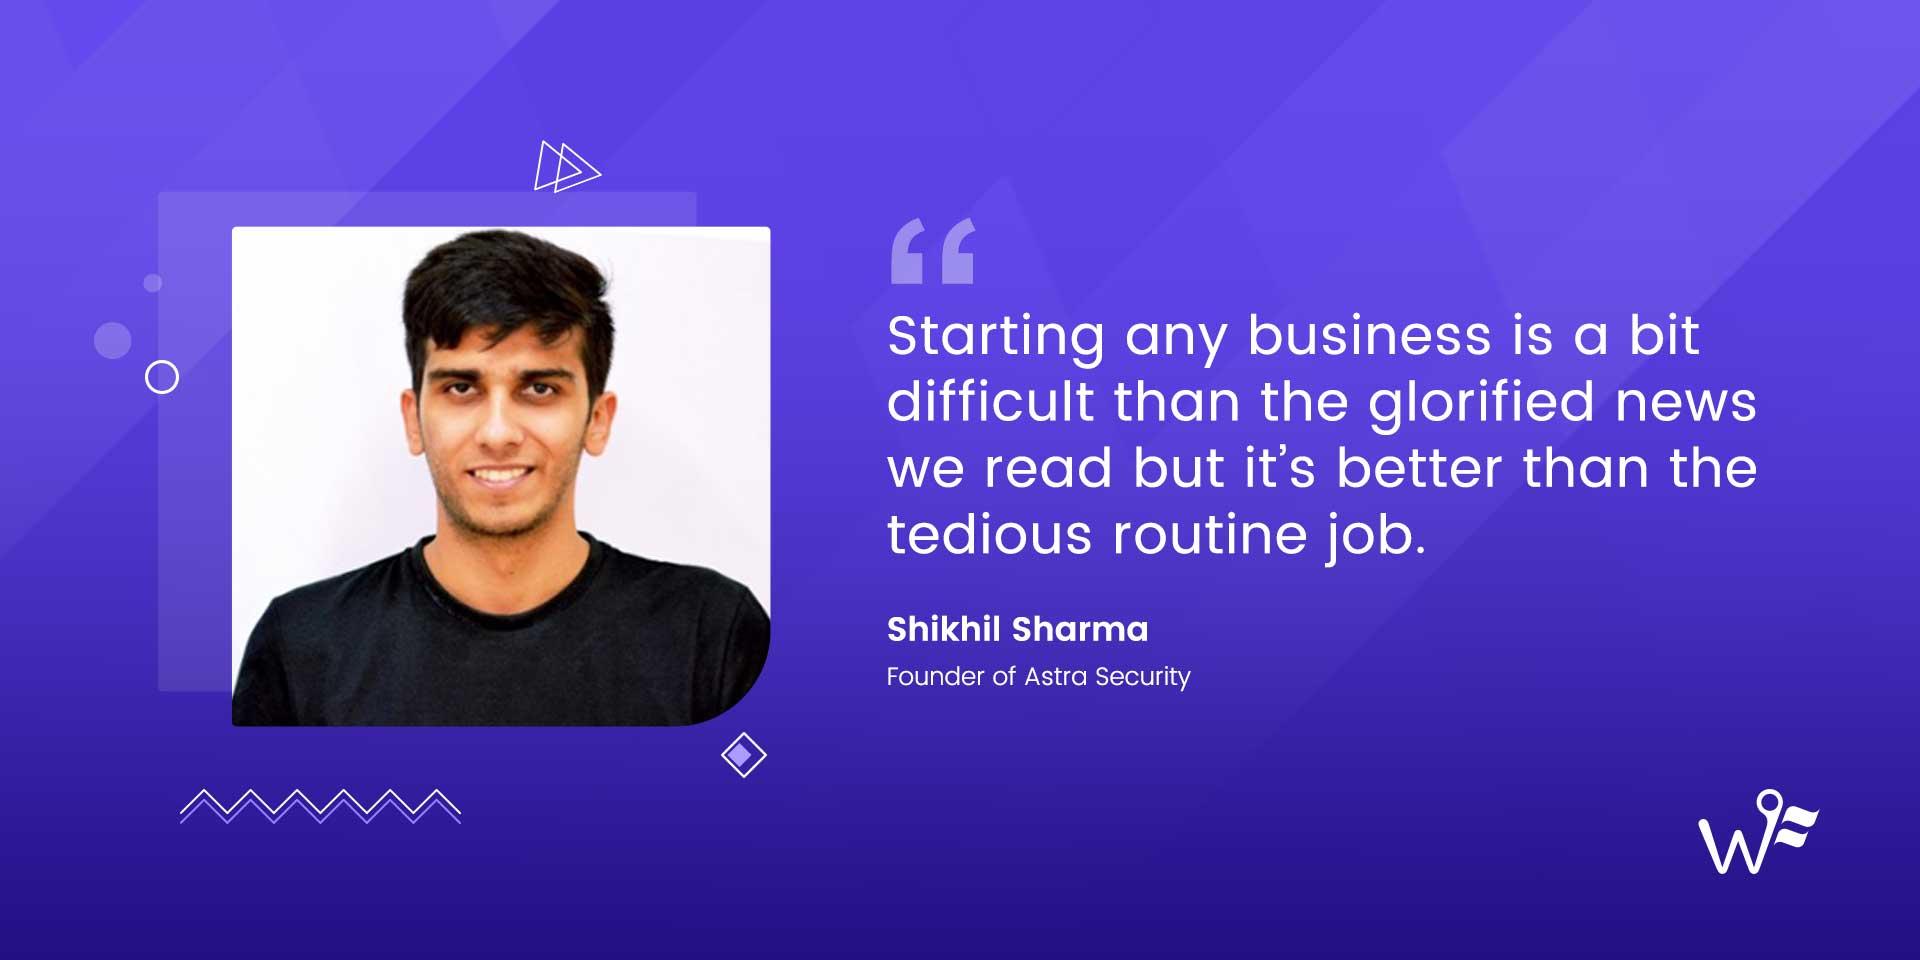 Shikhil Sharma of Astra Security